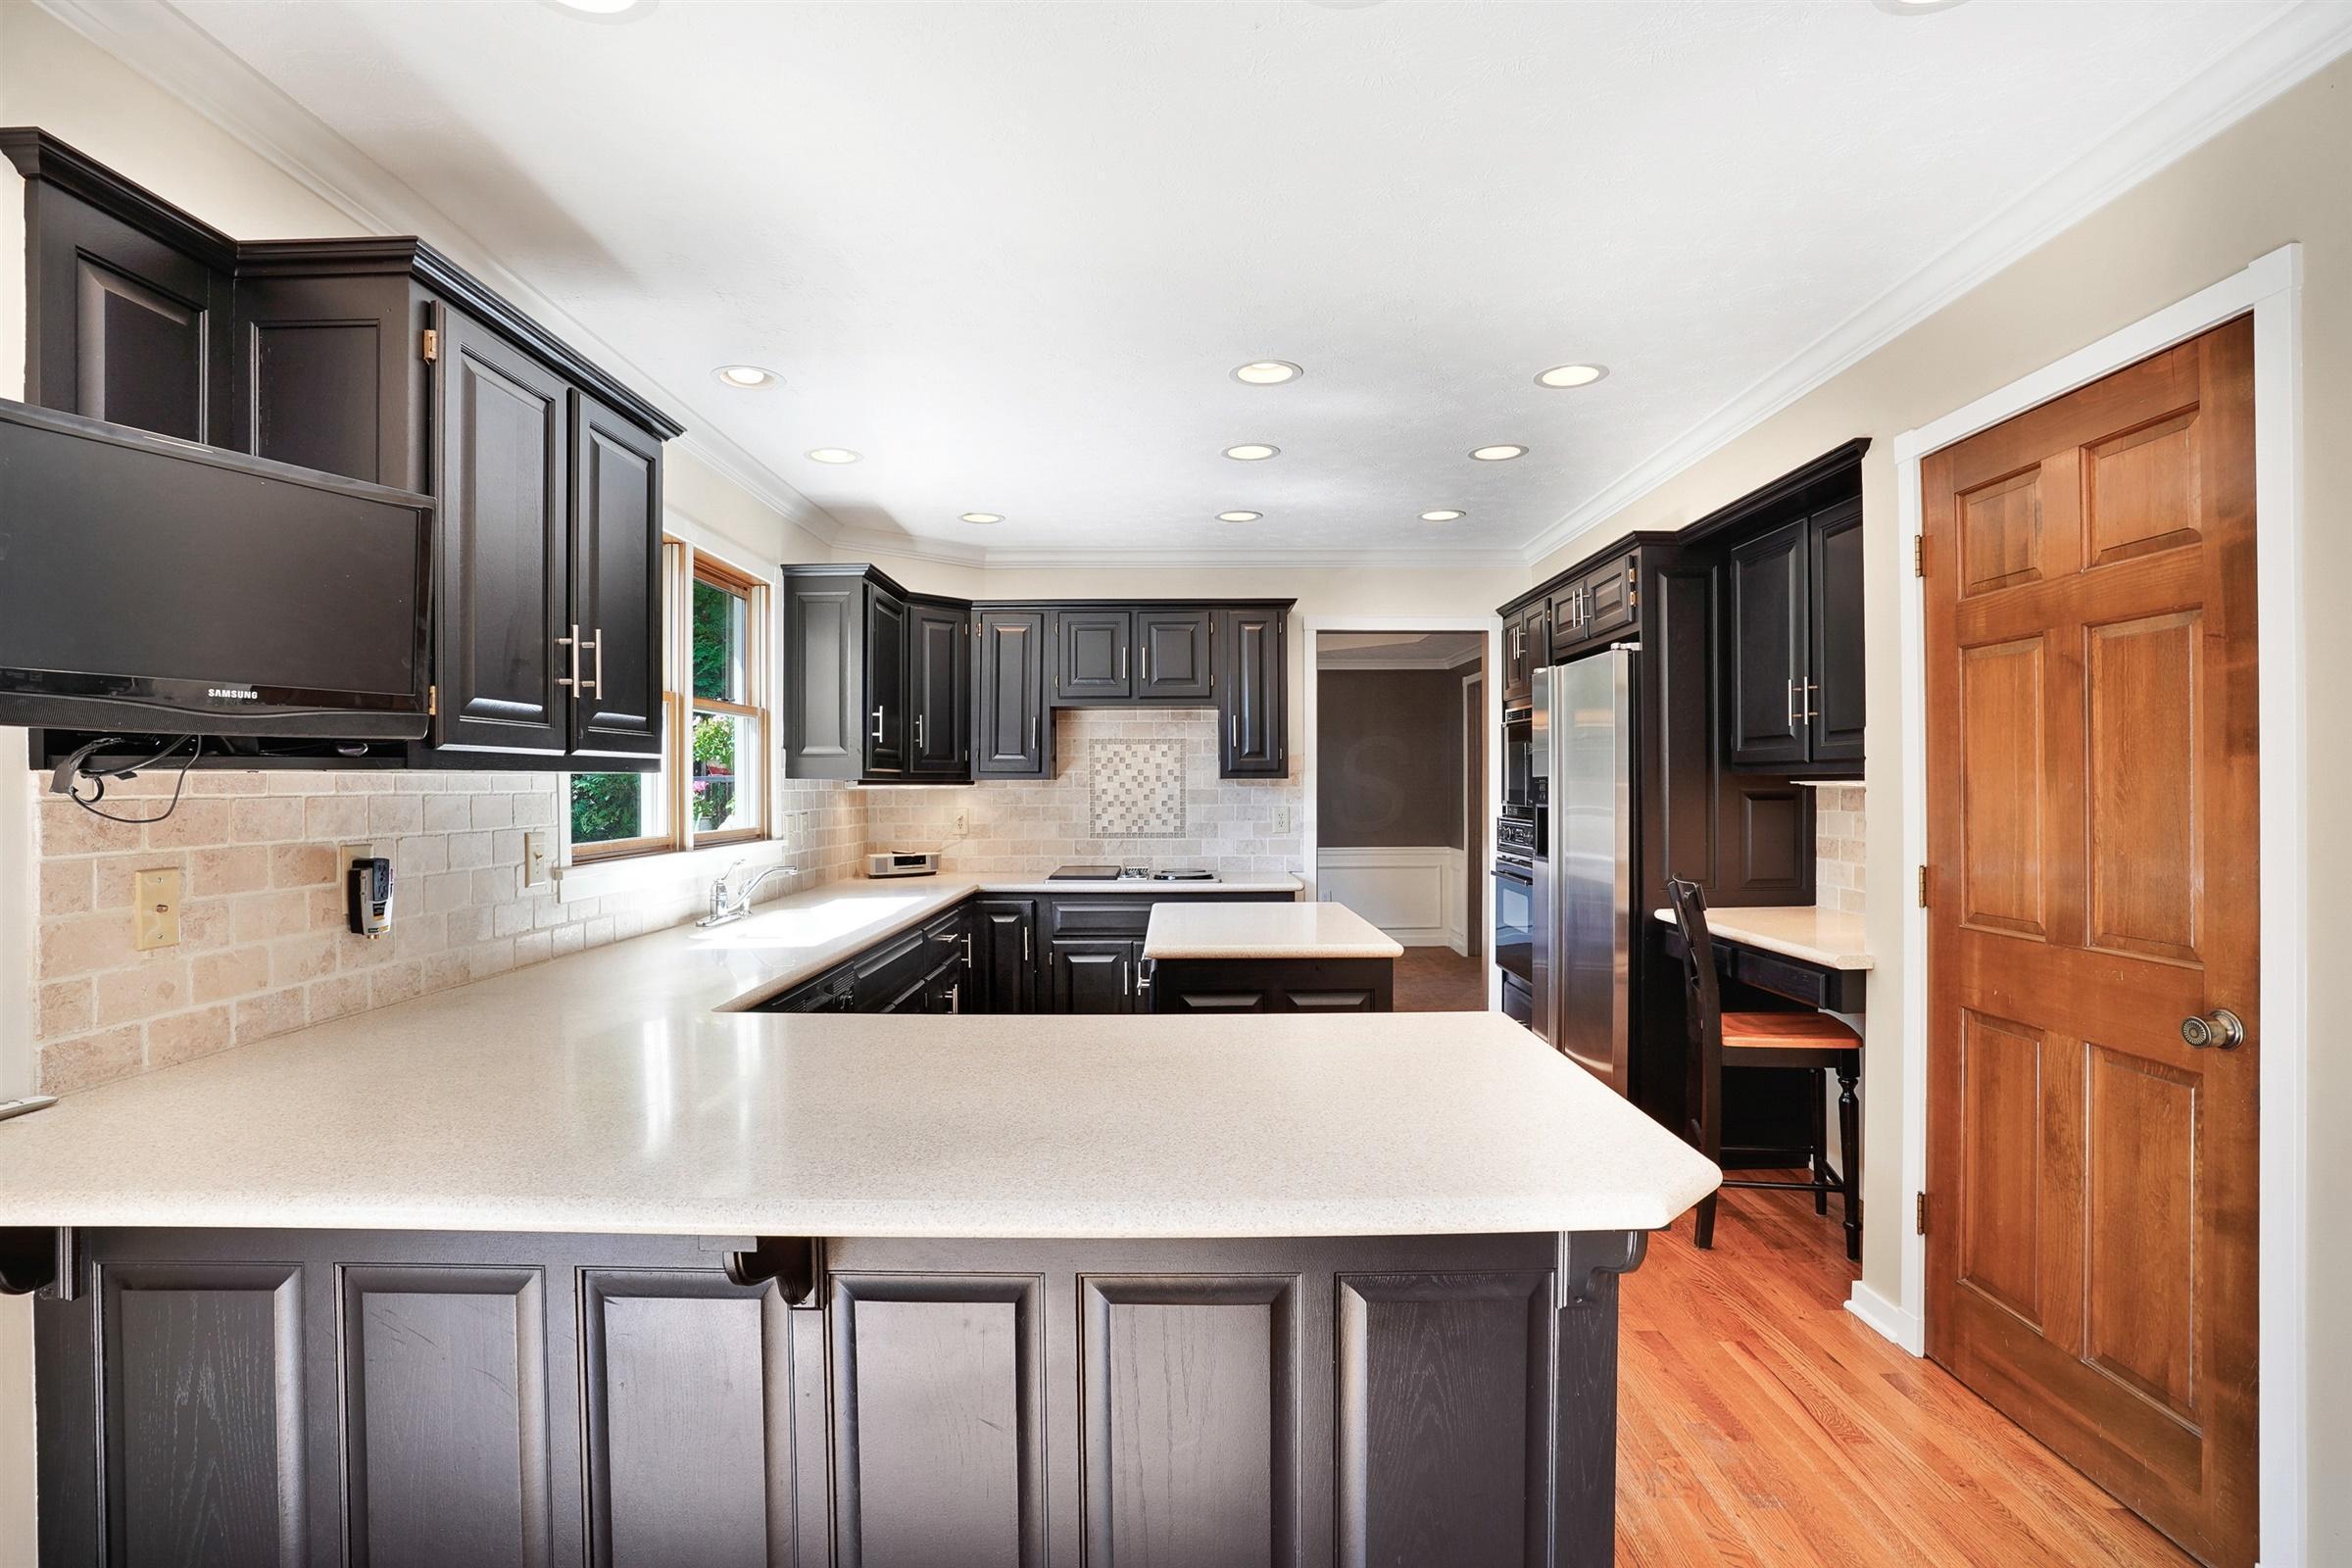 8862 Locherbie Court, Dublin, Ohio 43017, 4 Bedrooms Bedrooms, ,5 BathroomsBathrooms,Residential,For Sale,Locherbie,220025800